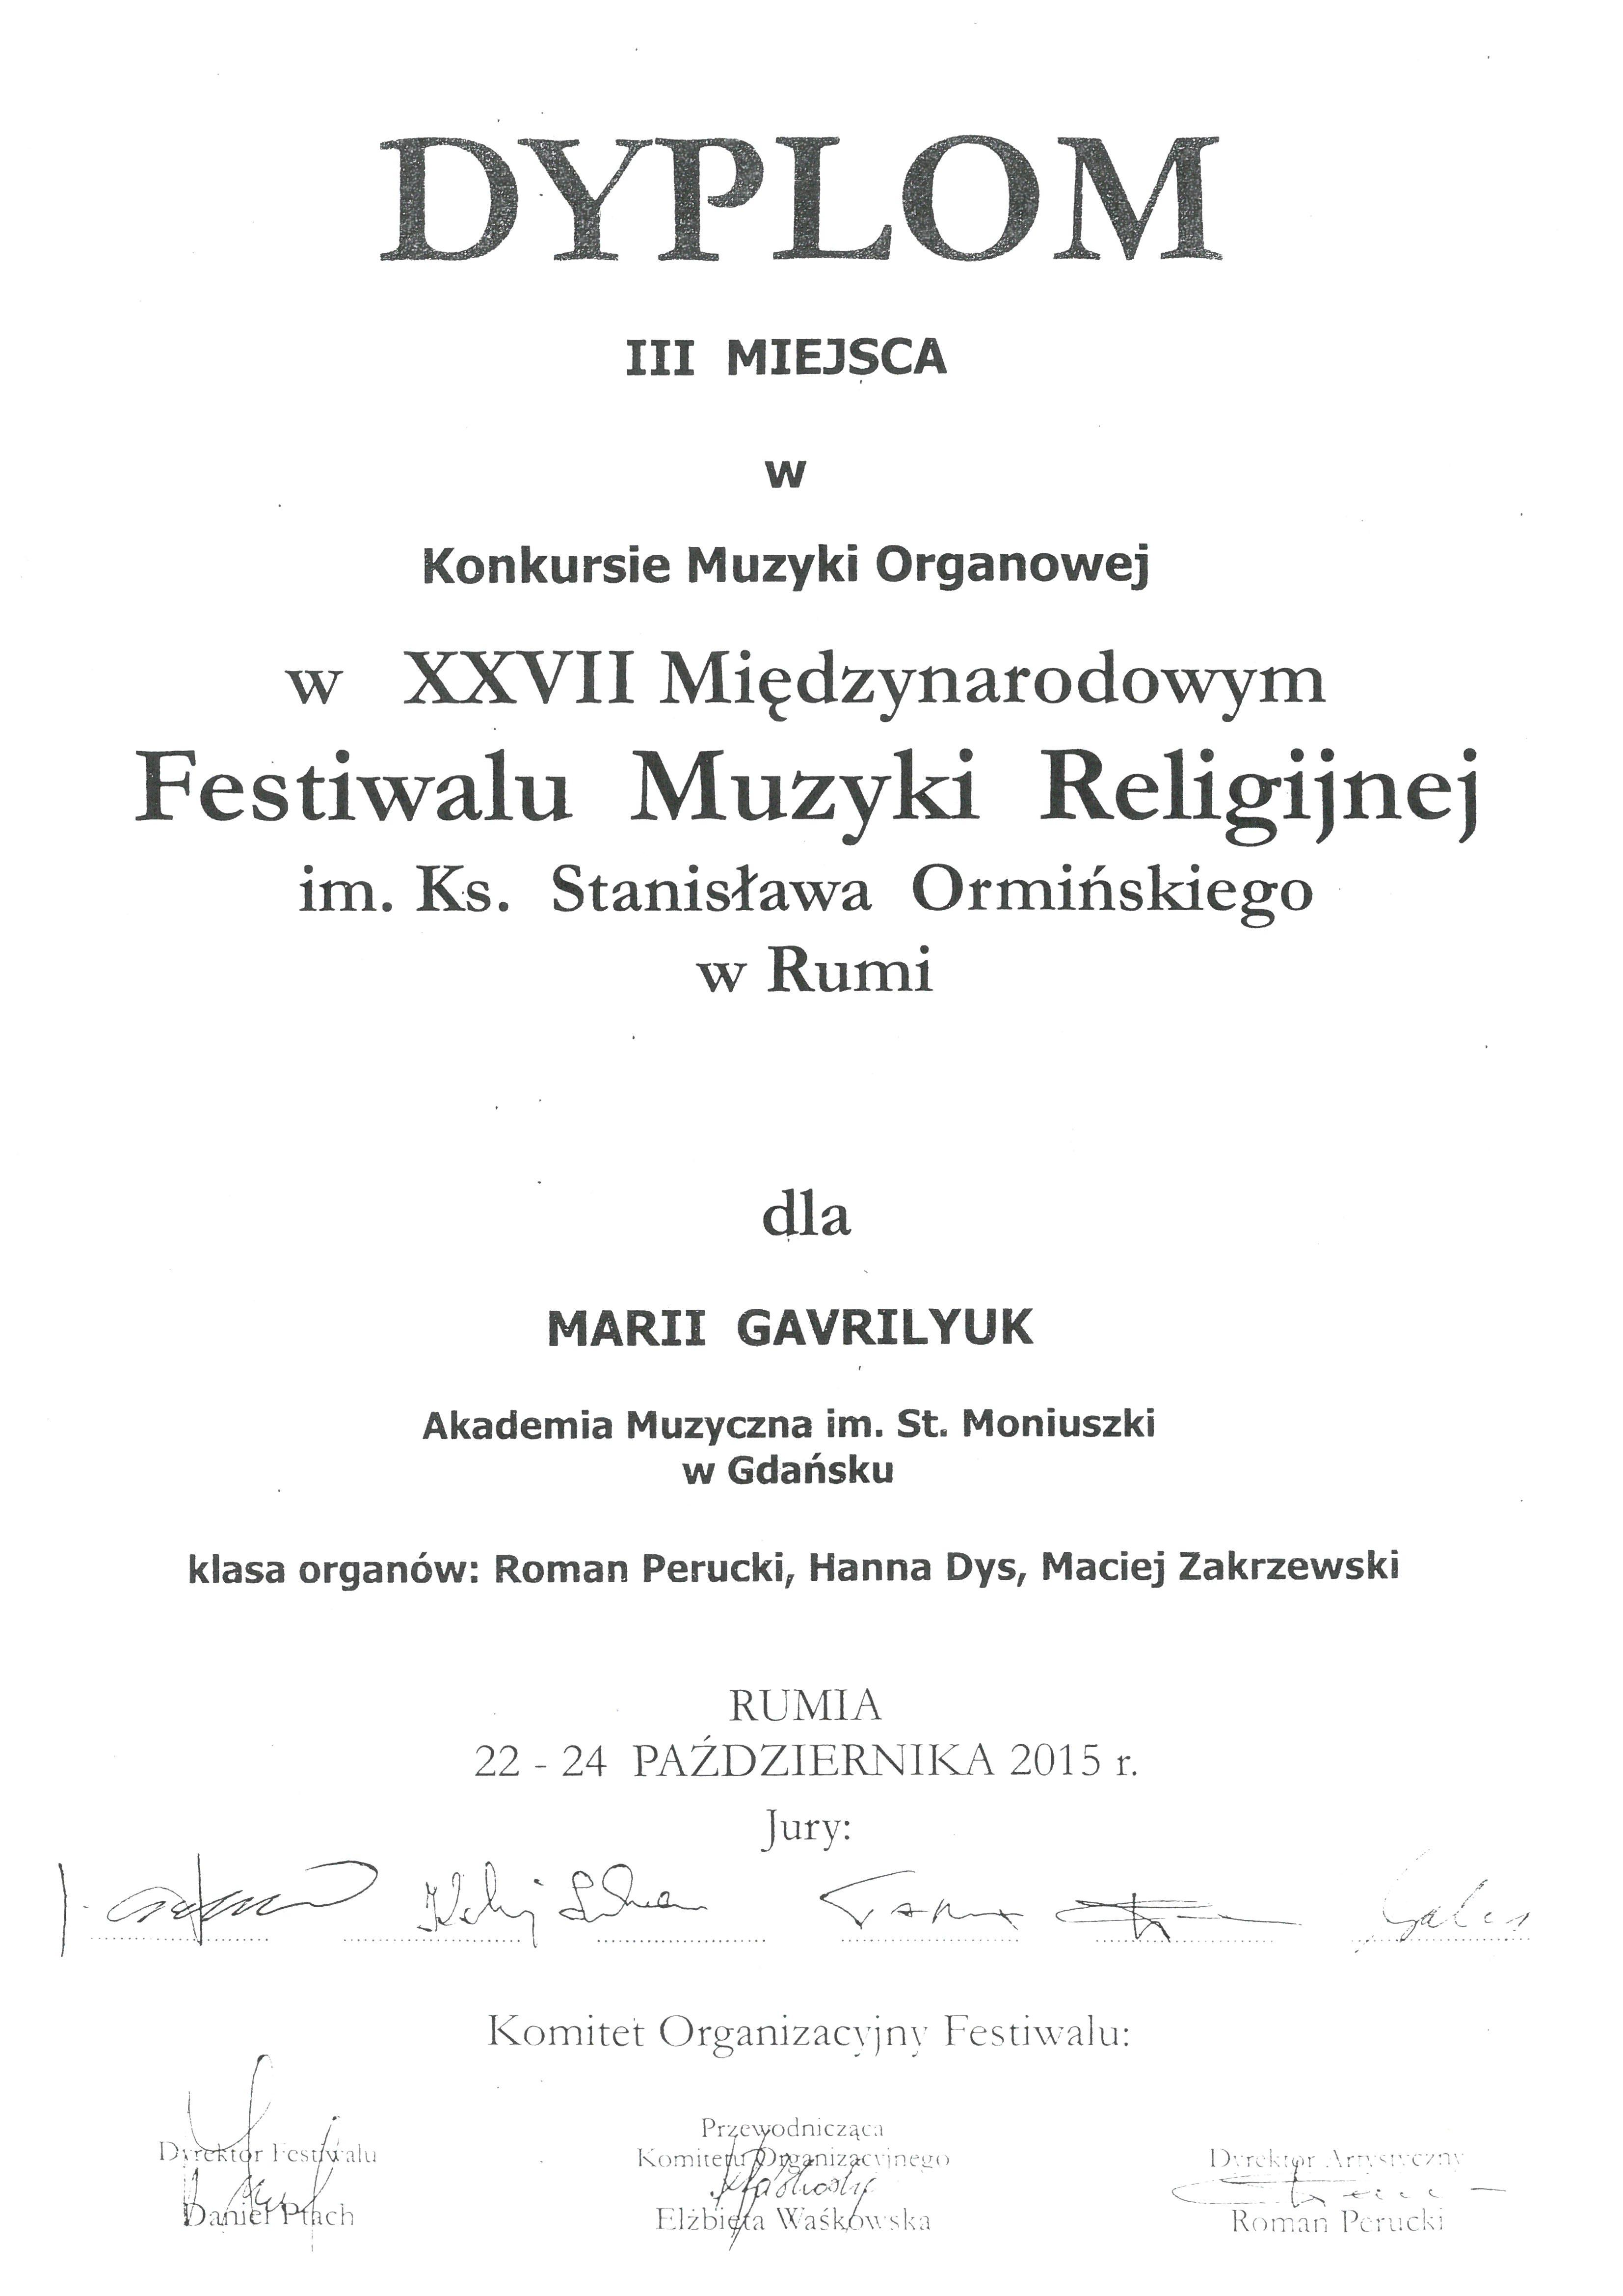 Maria Gavrilyuk_III_msce_dyplom_Rumia_2015